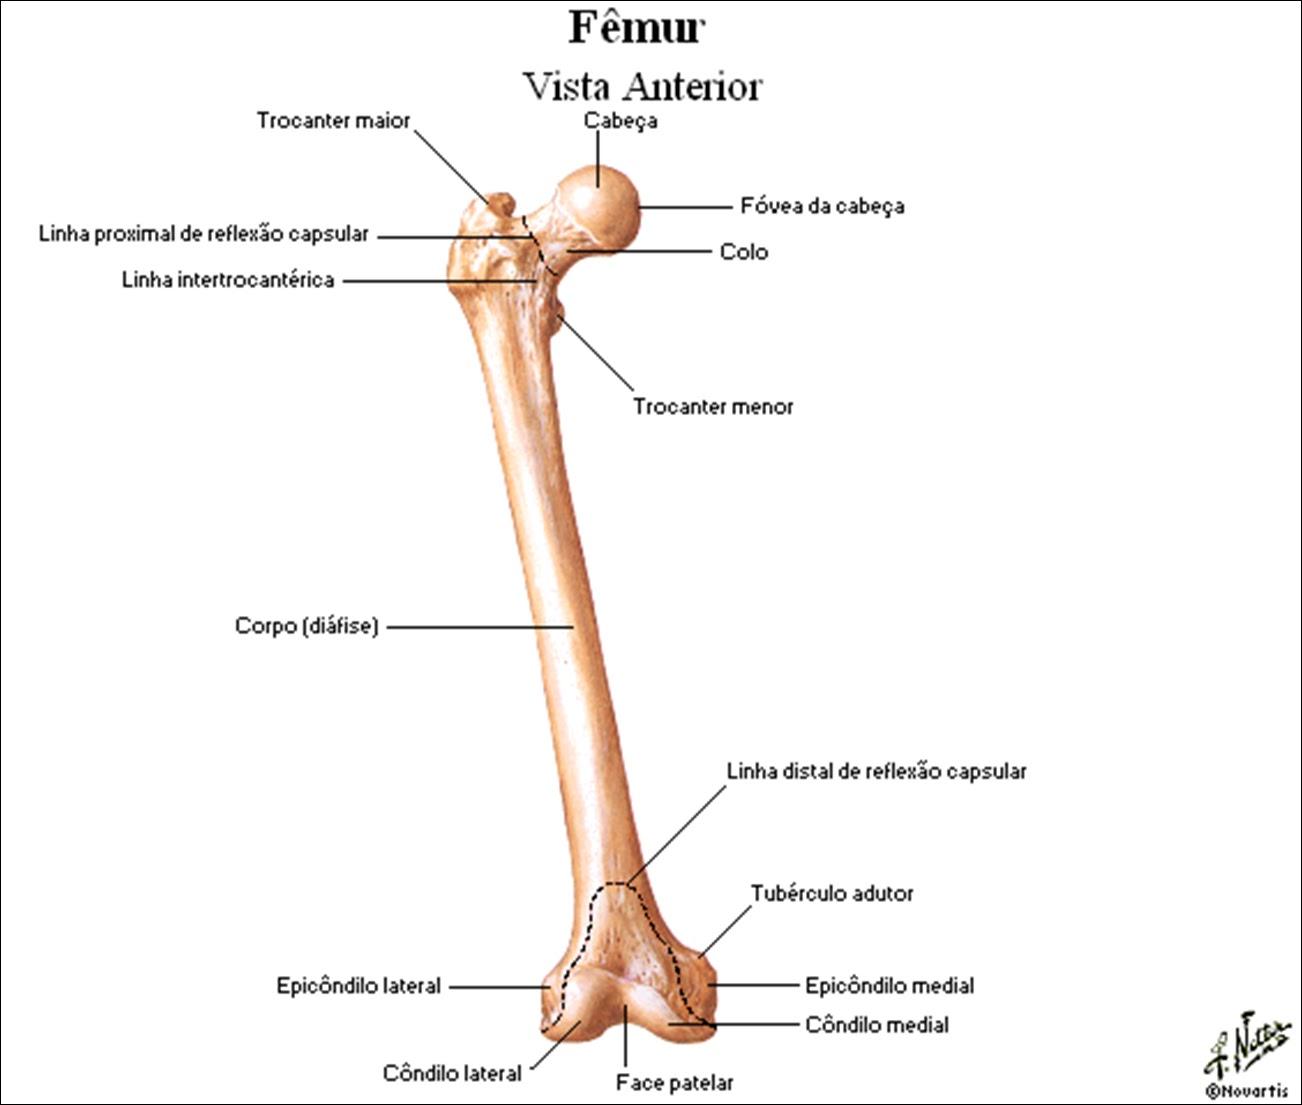 bontrager anatomia radiologica online pdf